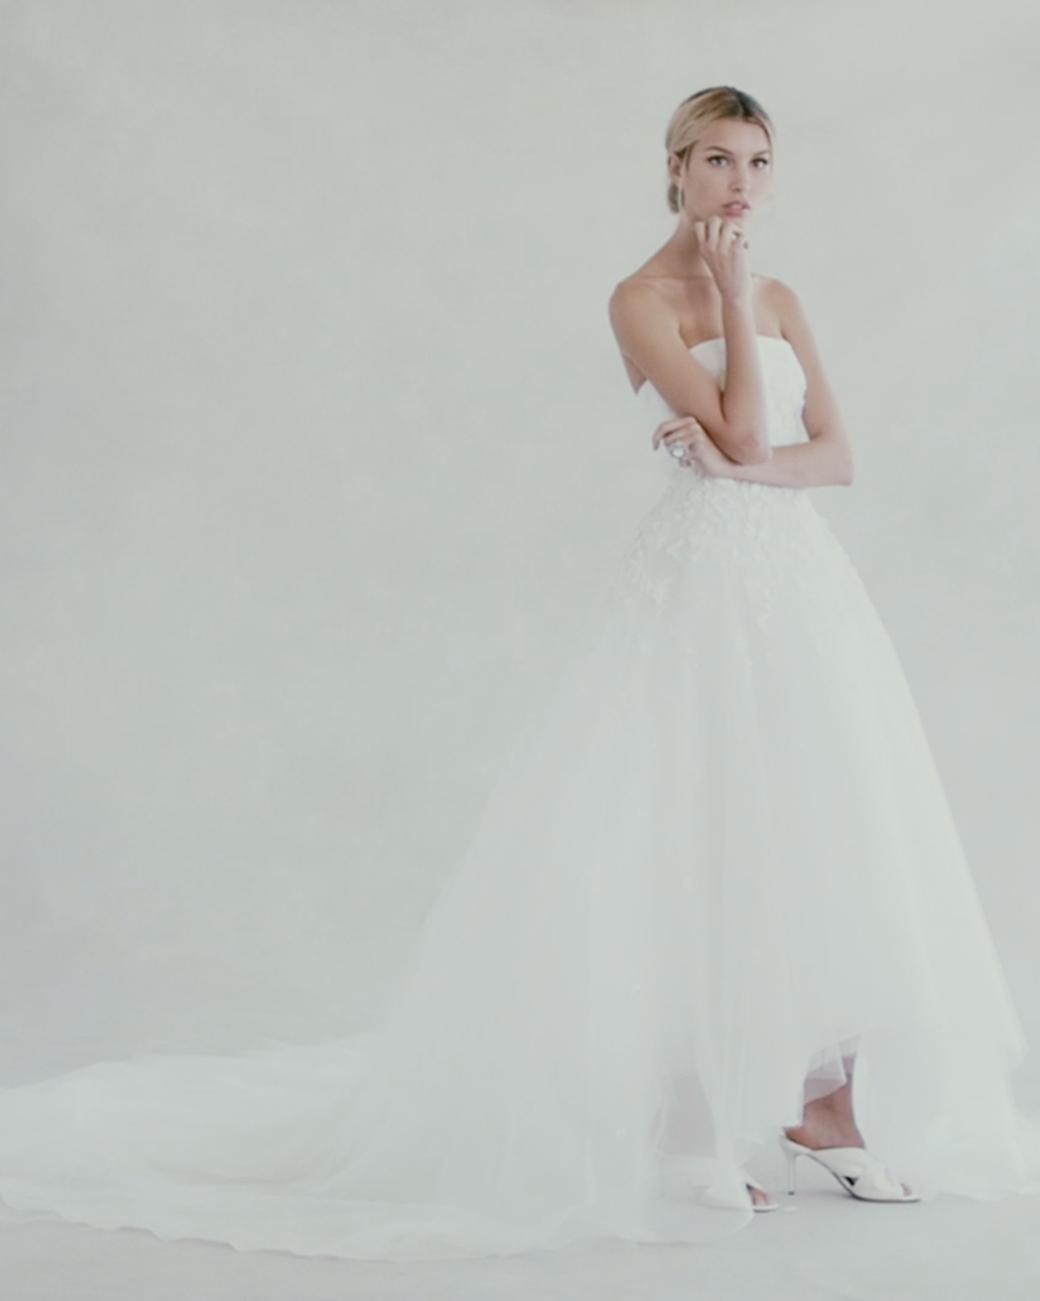 A sneak peek at Oscar de la Renta's Fall 2017 wedding dress collection